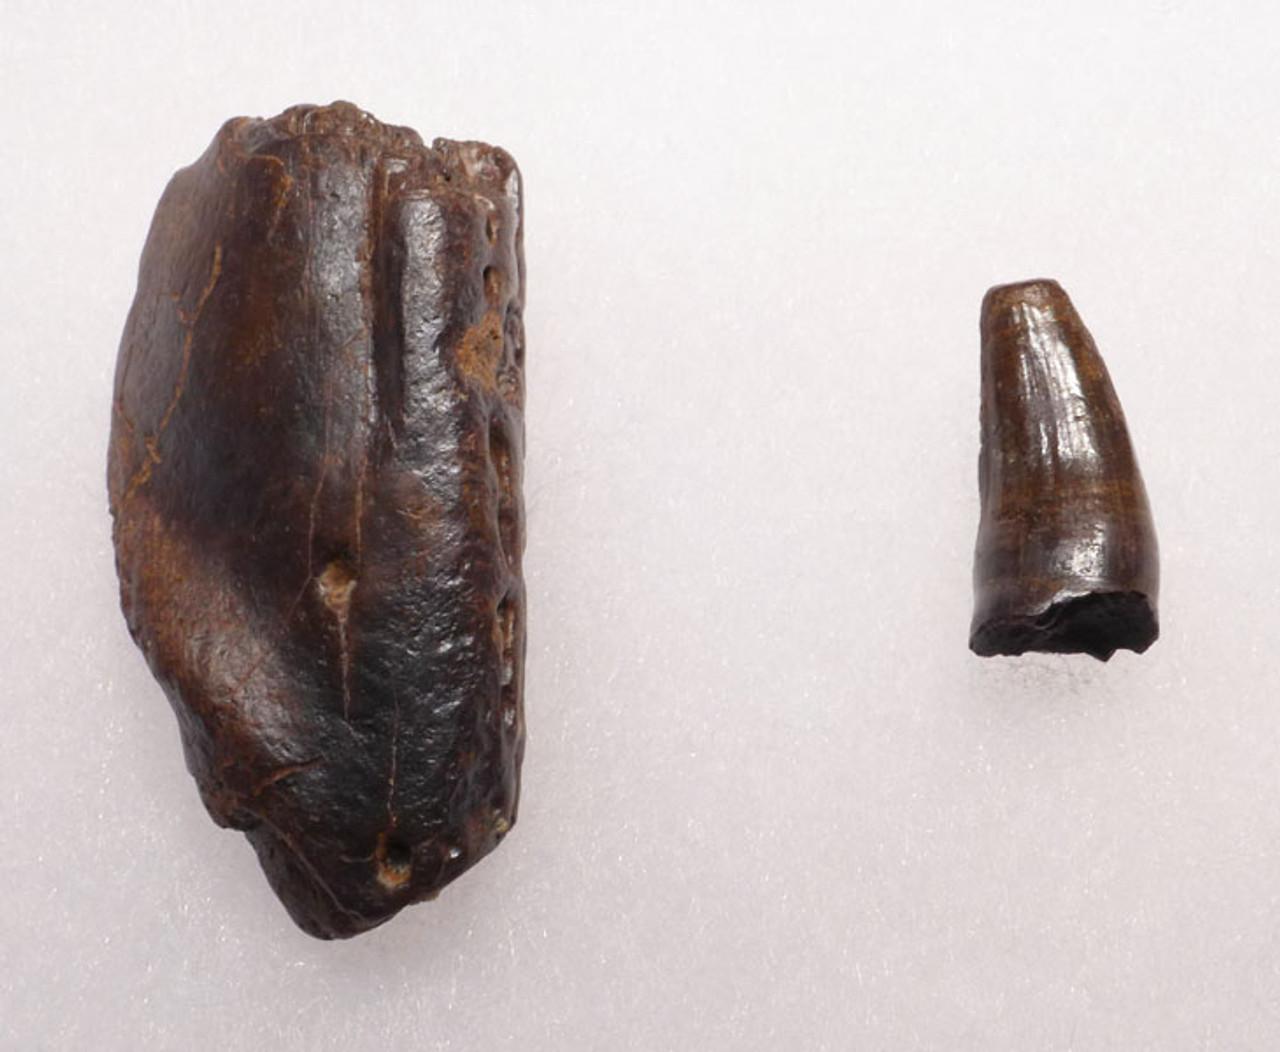 CROC037 - DINOSAUR-ERA LEIDYOSUCHUS CROCODILE TOOTH WITH PORTION OF MANDIBLE JAW